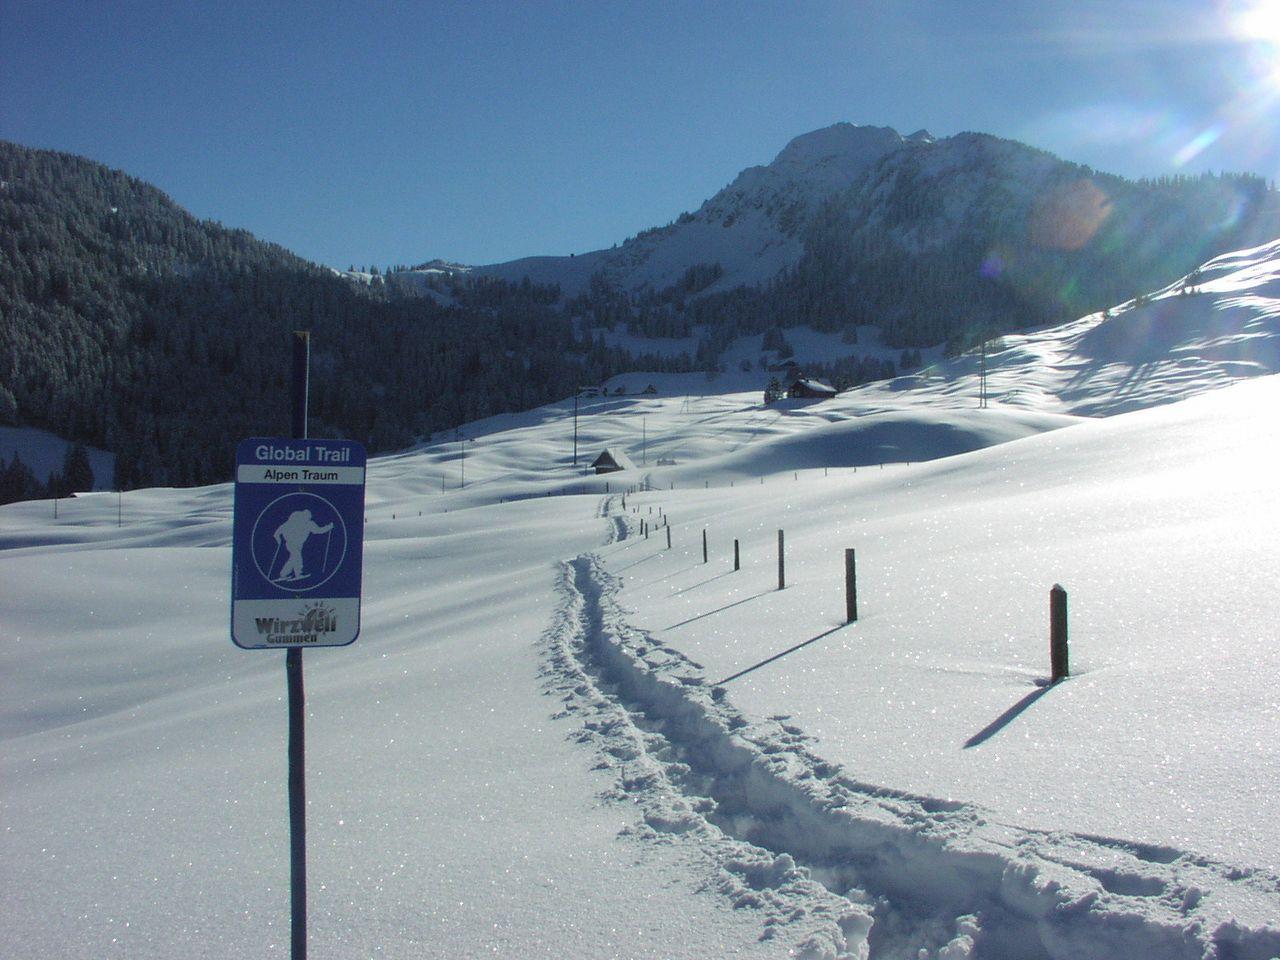 Snowshoeing and Winter walking Wirzweli